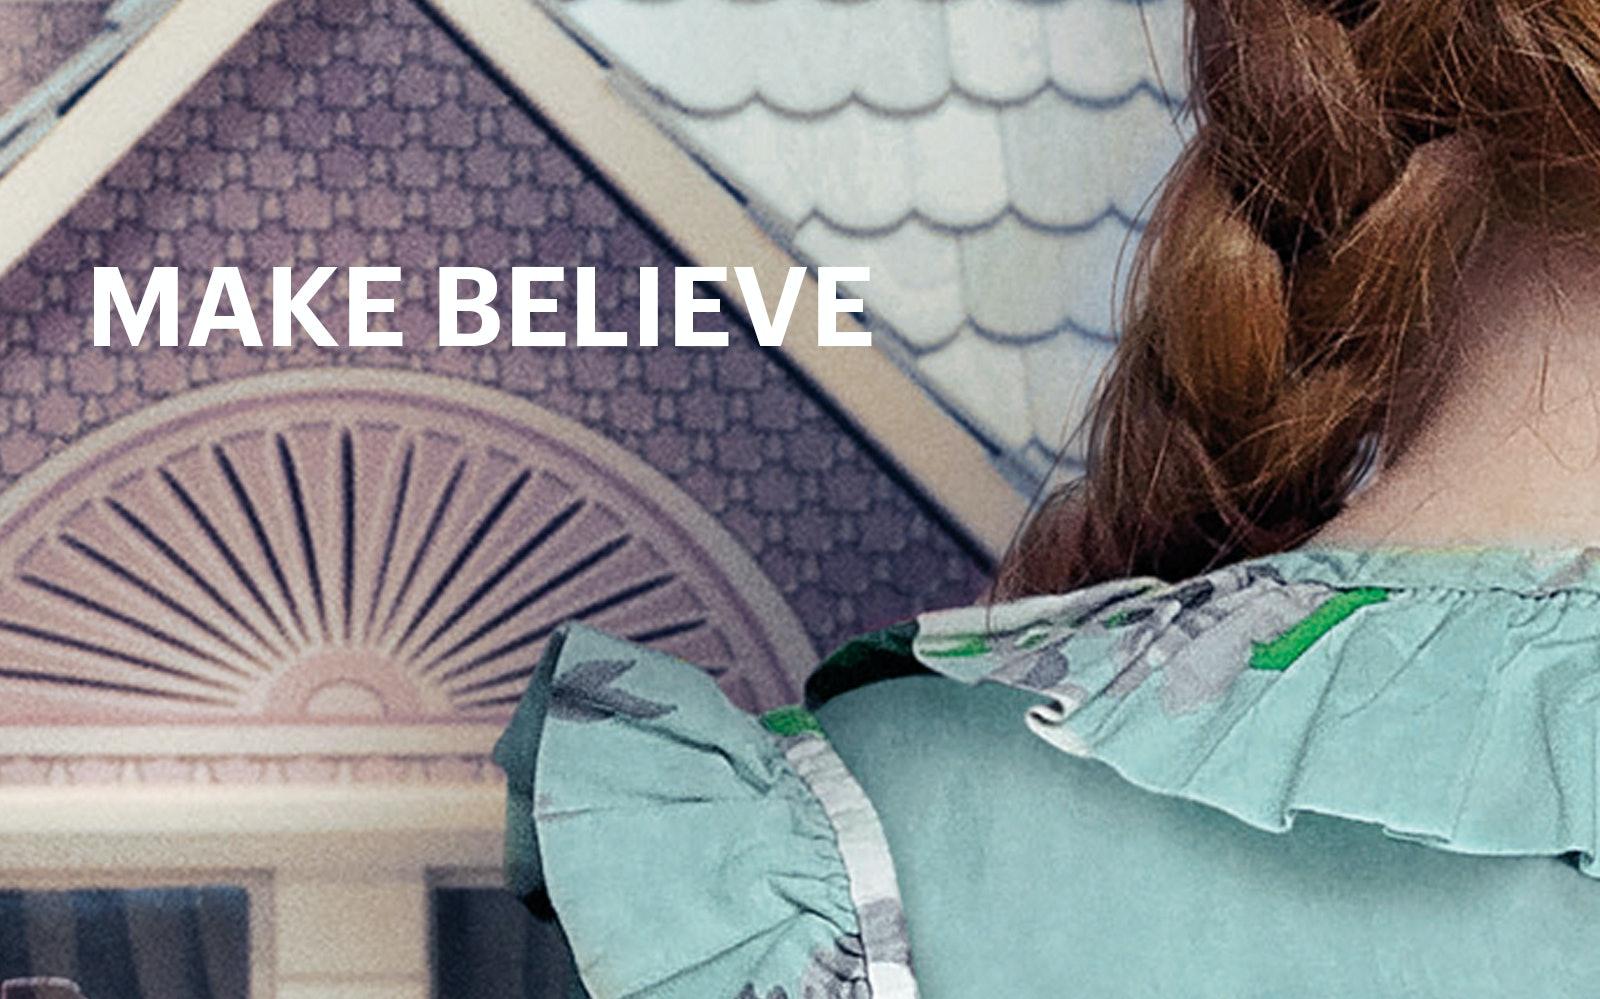 Make Believe Off-Broadway Play